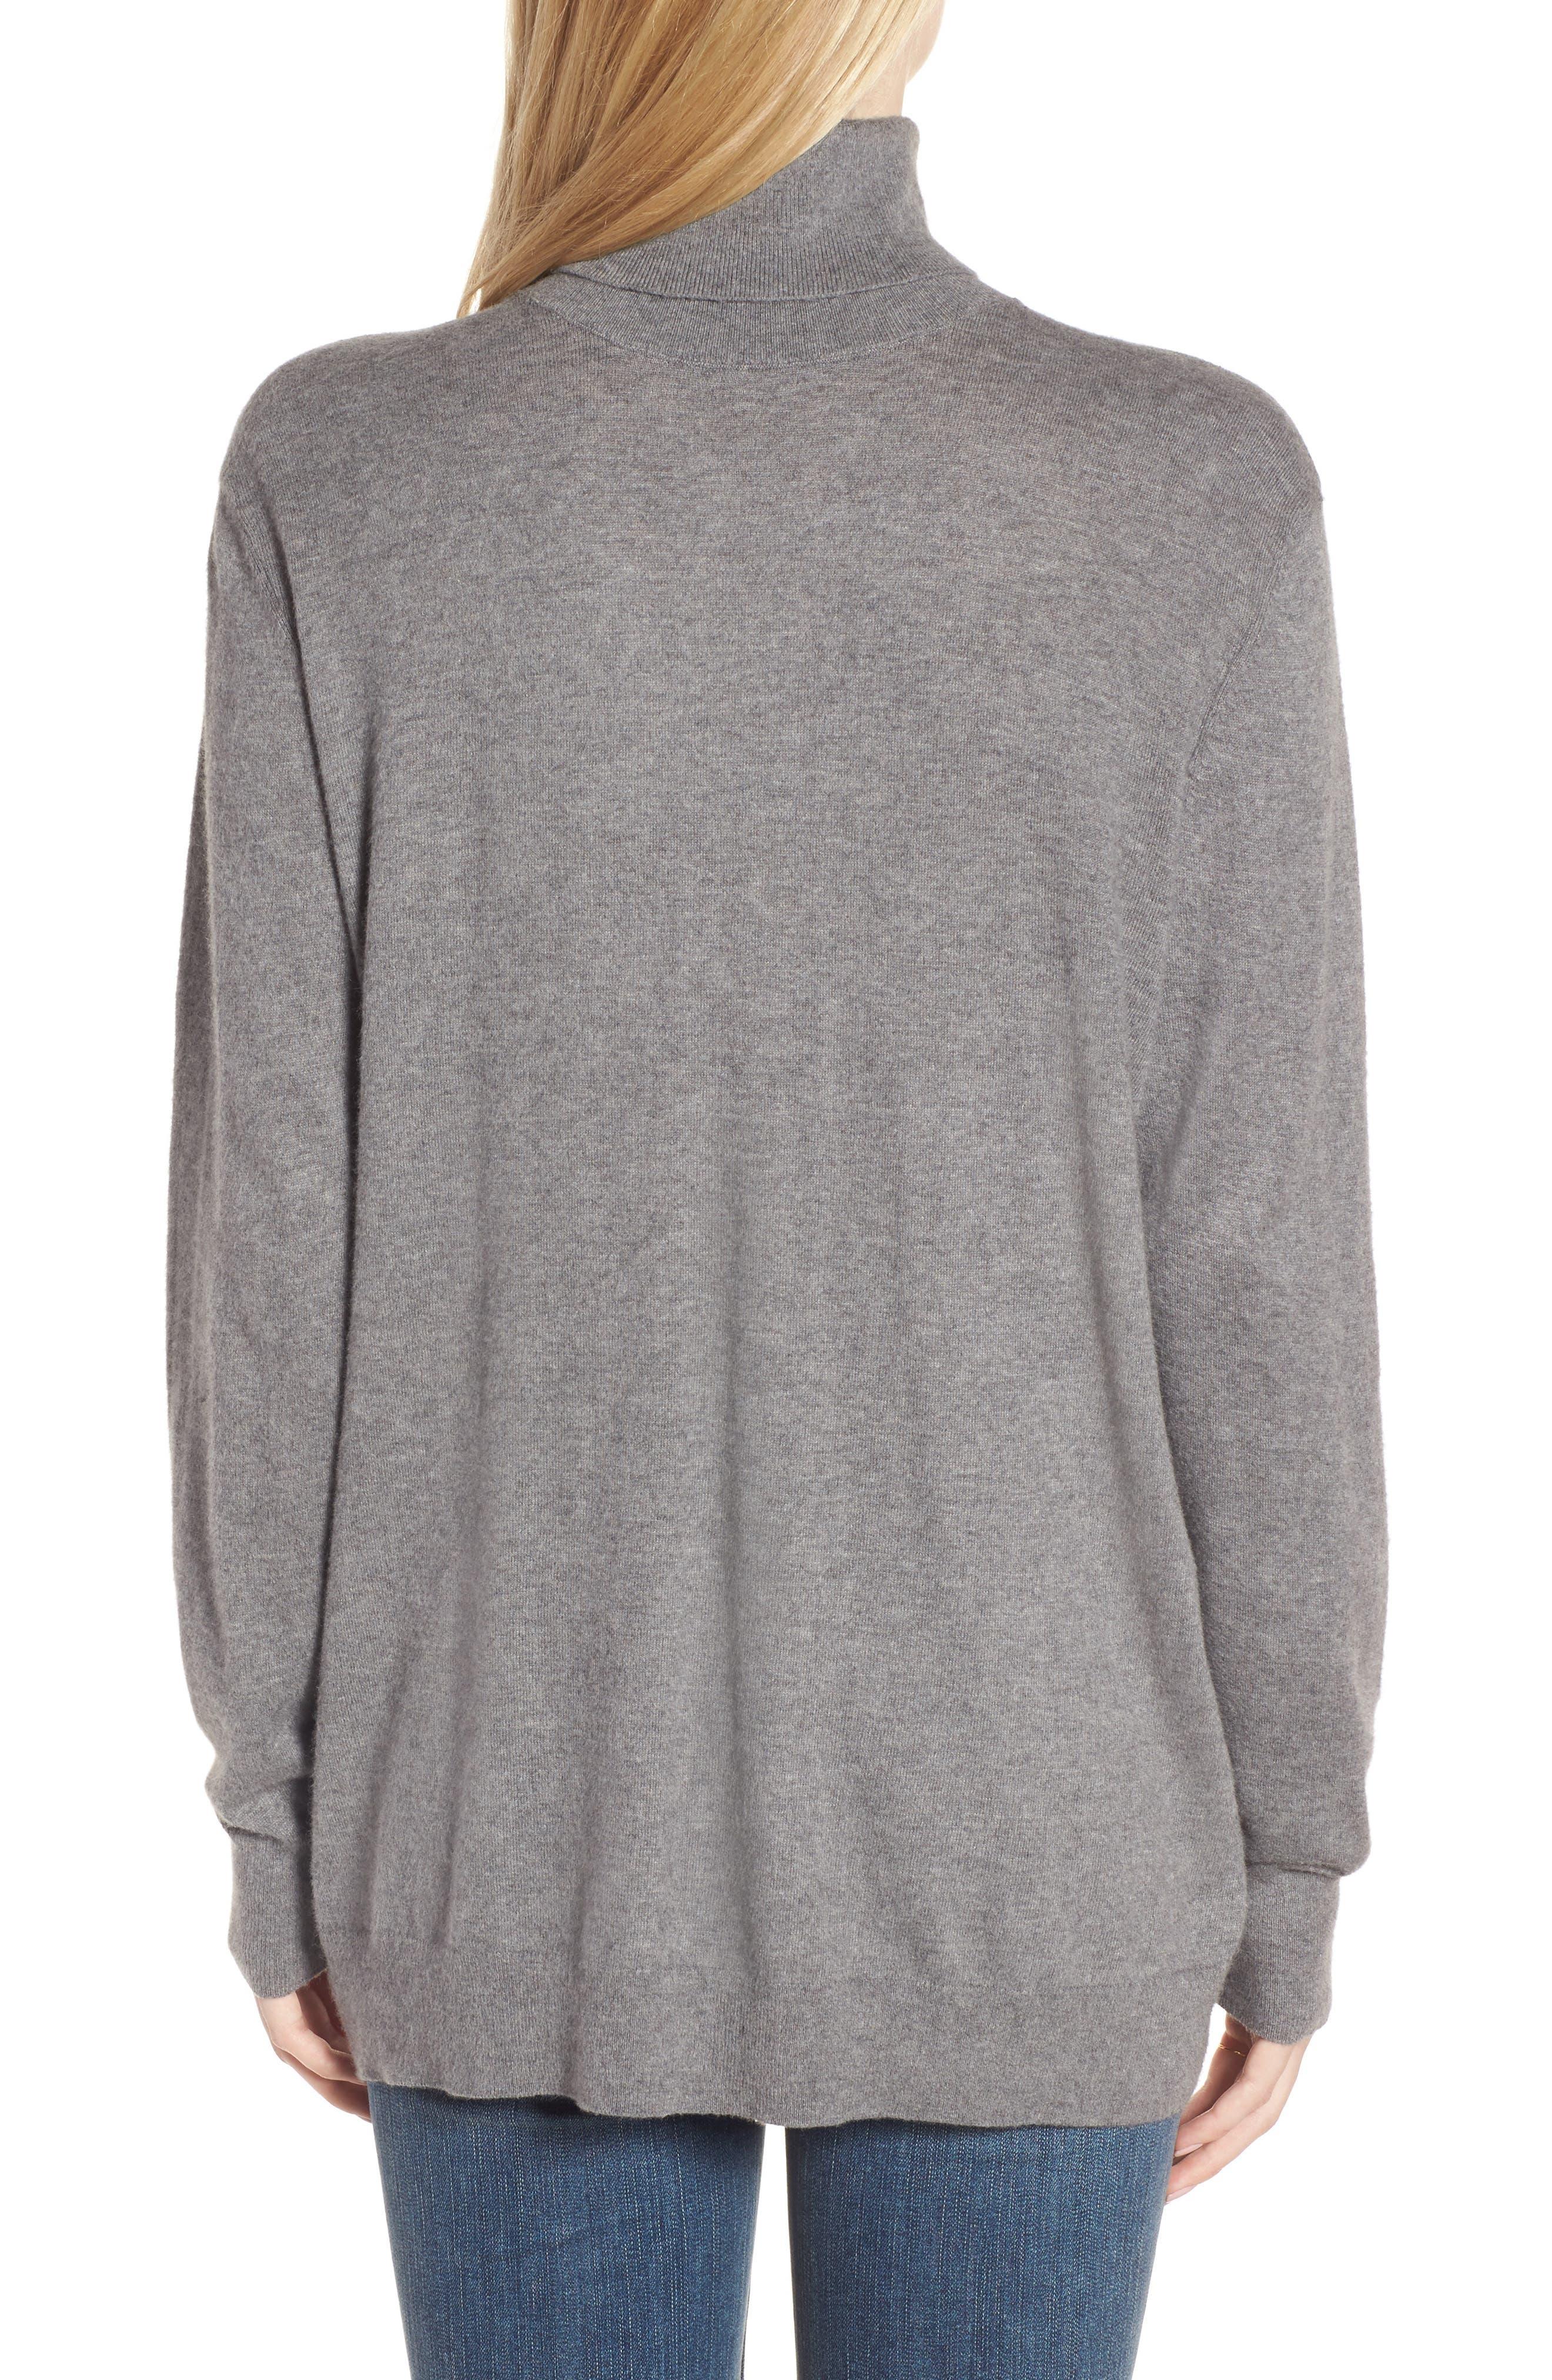 Boyfriend Turtleneck Sweater,                             Alternate thumbnail 5, color,